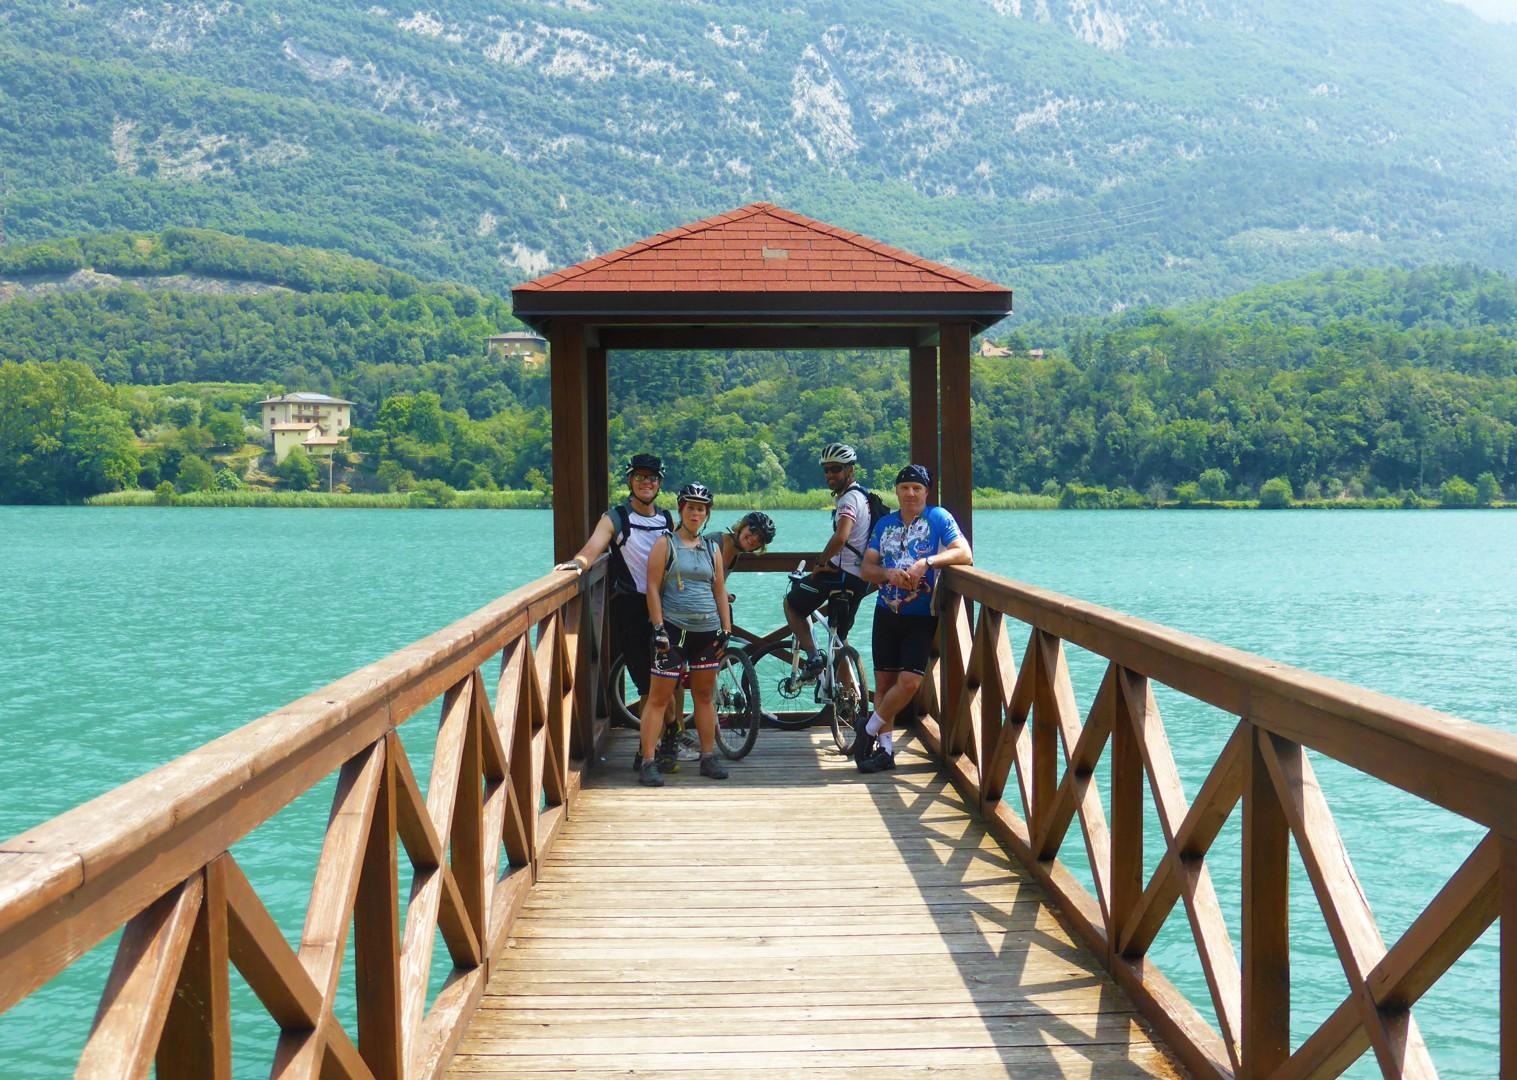 enjoy-ice-cream-shores-lake-garda-cycling-holiday.jpg - Austria and Italy - La Via Claudia - Guided Leisure Cycling Holiday - Leisure Cycling